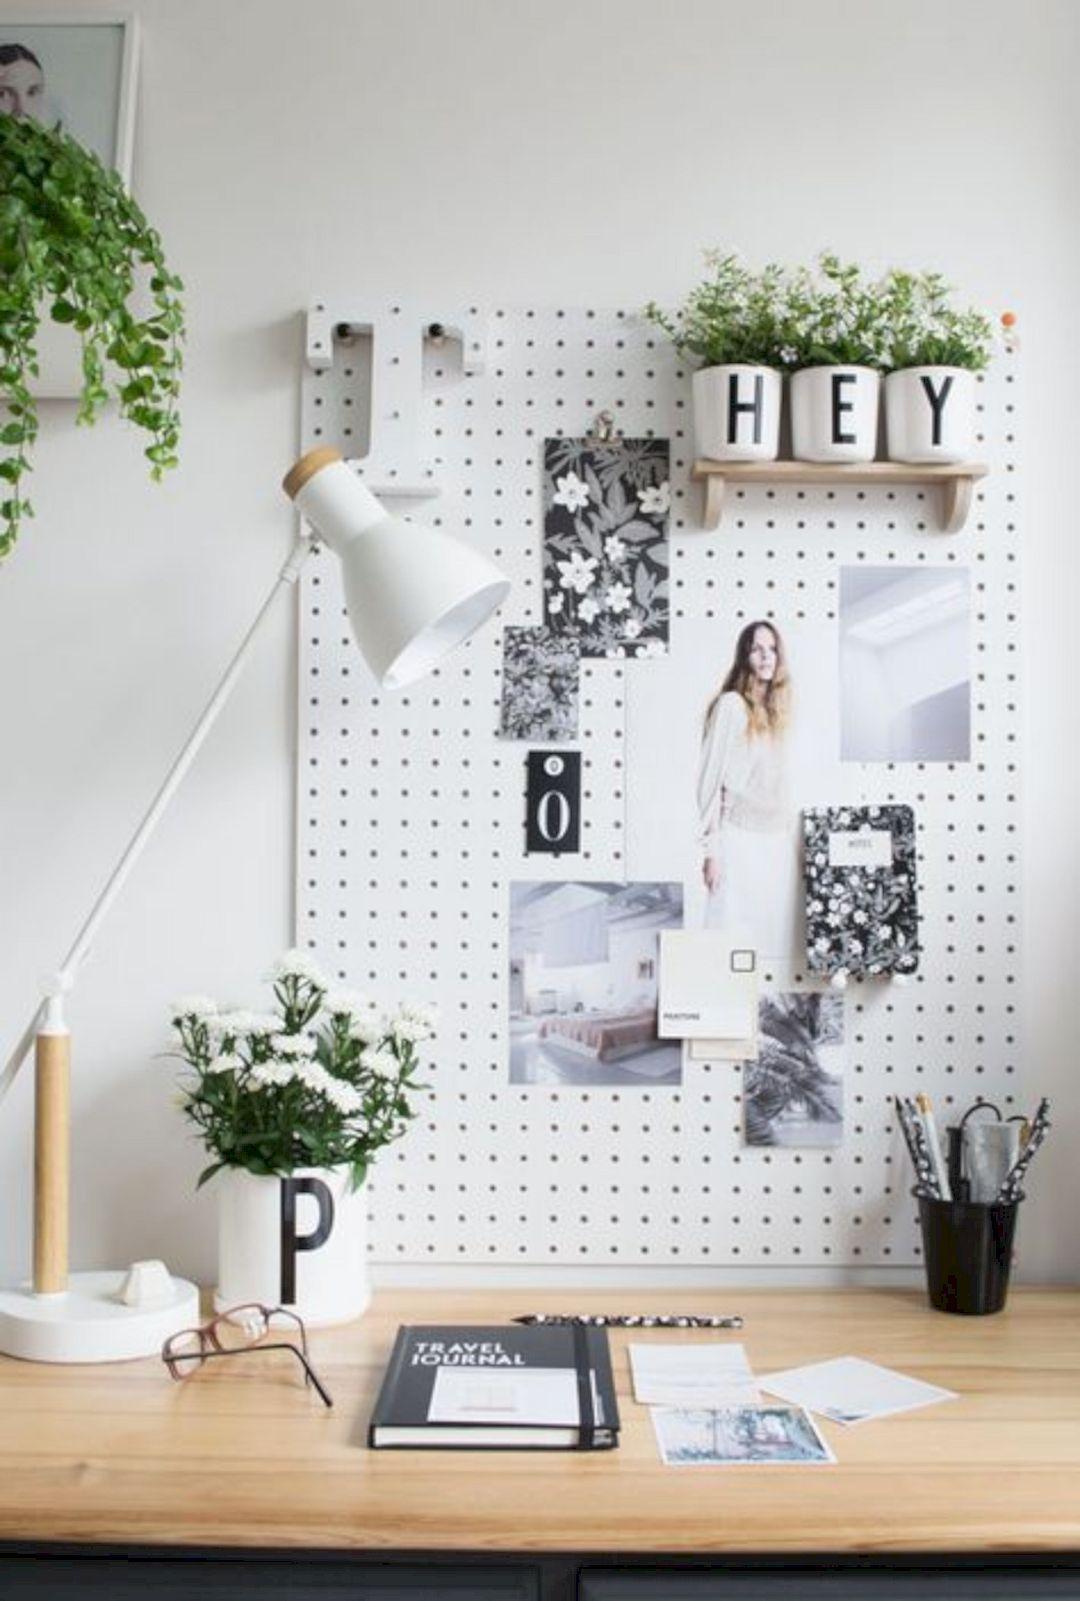 16 Office Wall Decoration Ideas Home Office Decor Minimalist